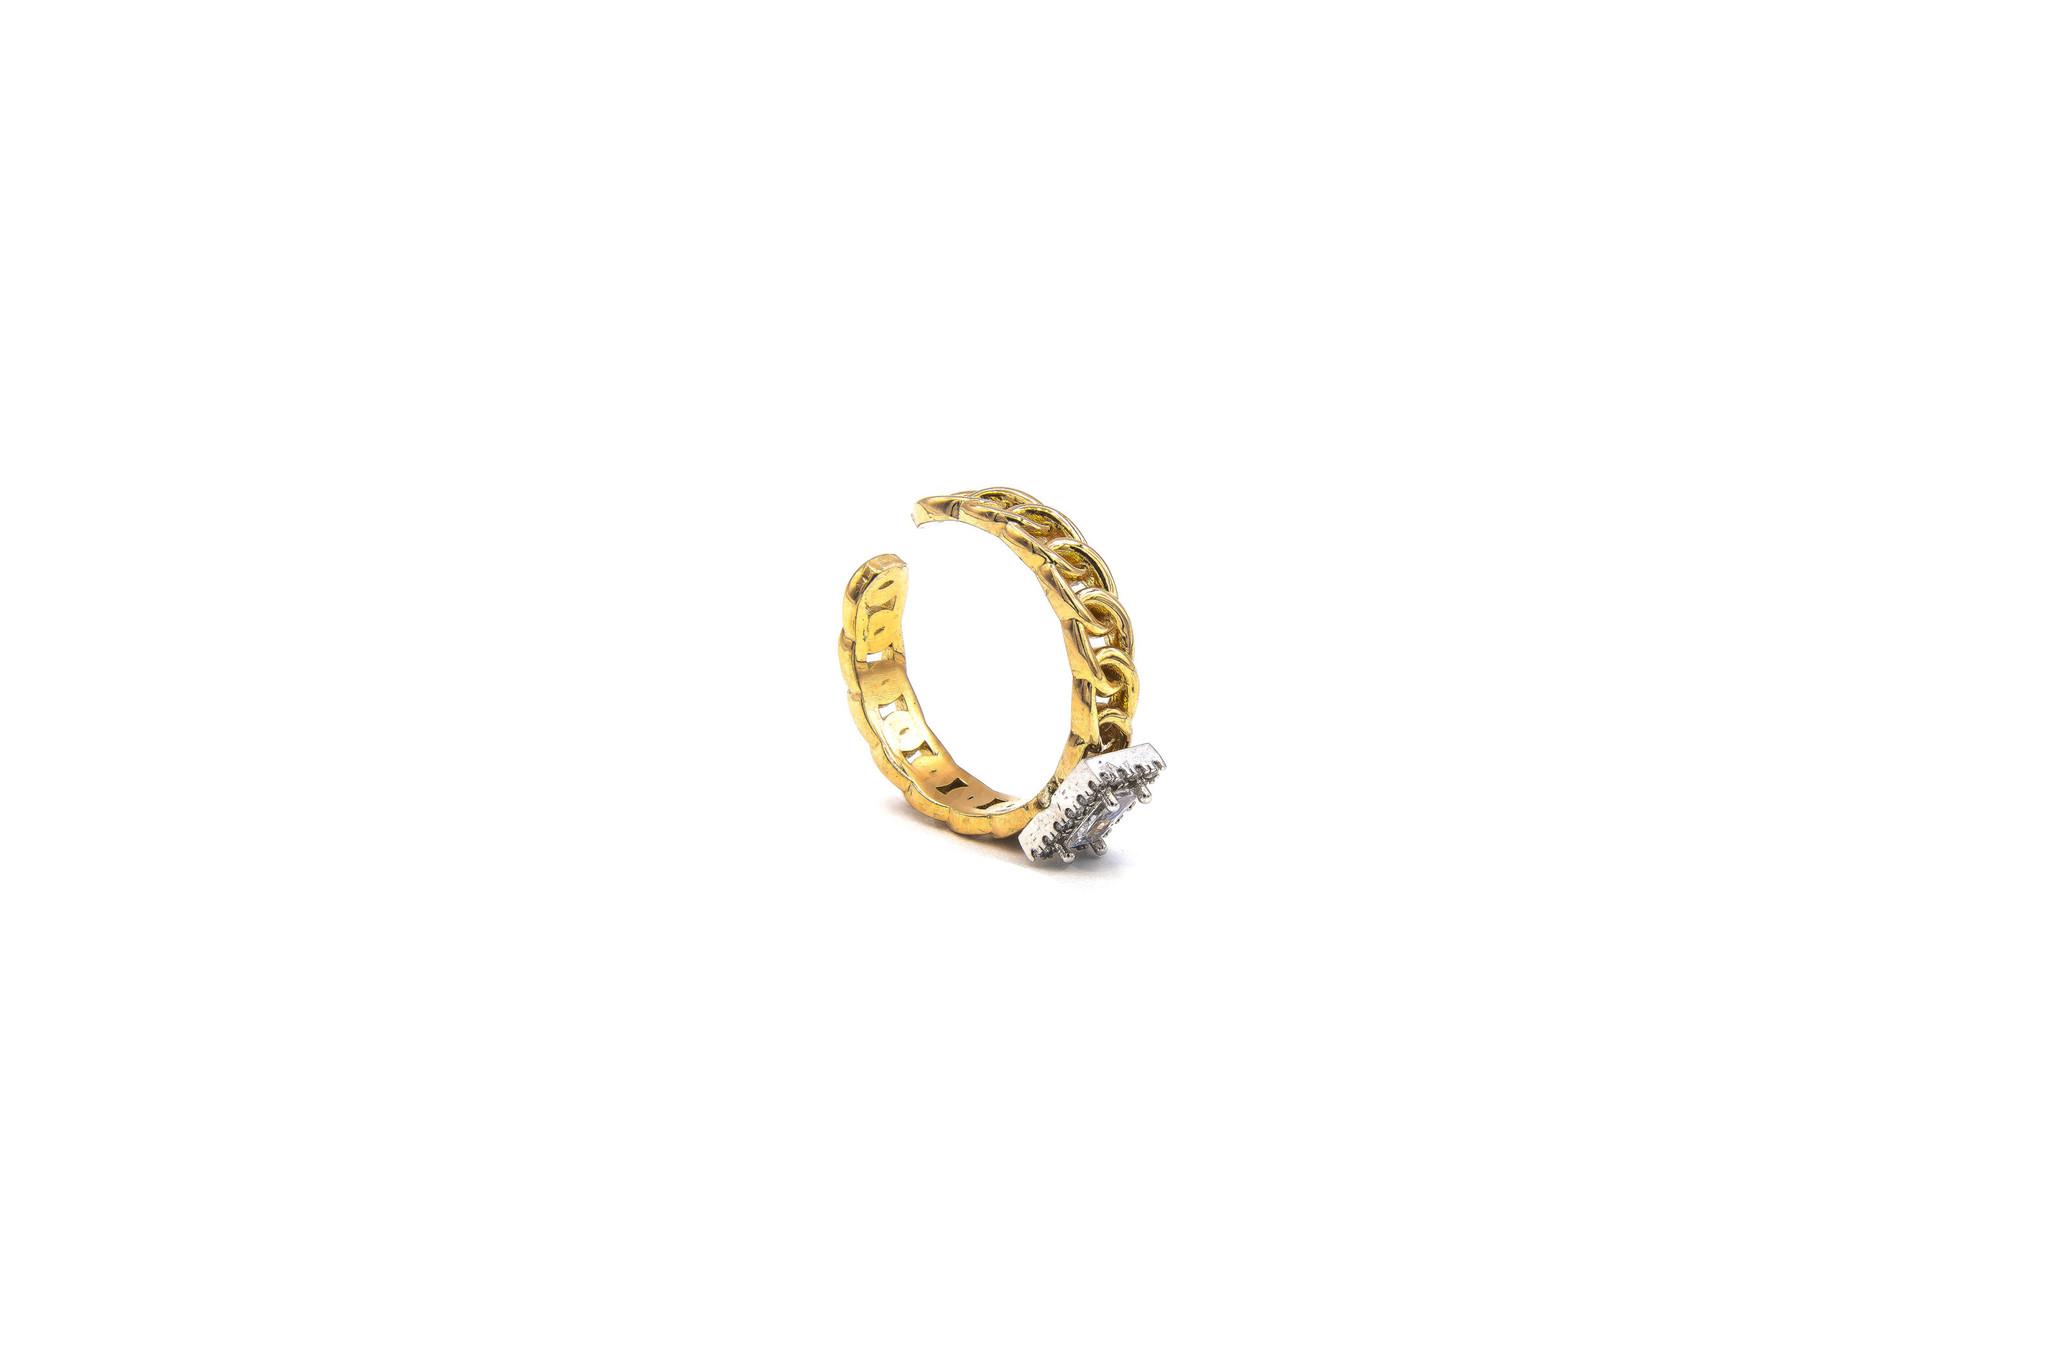 Ring rose schakel met vierkante witte steen bicolor-6